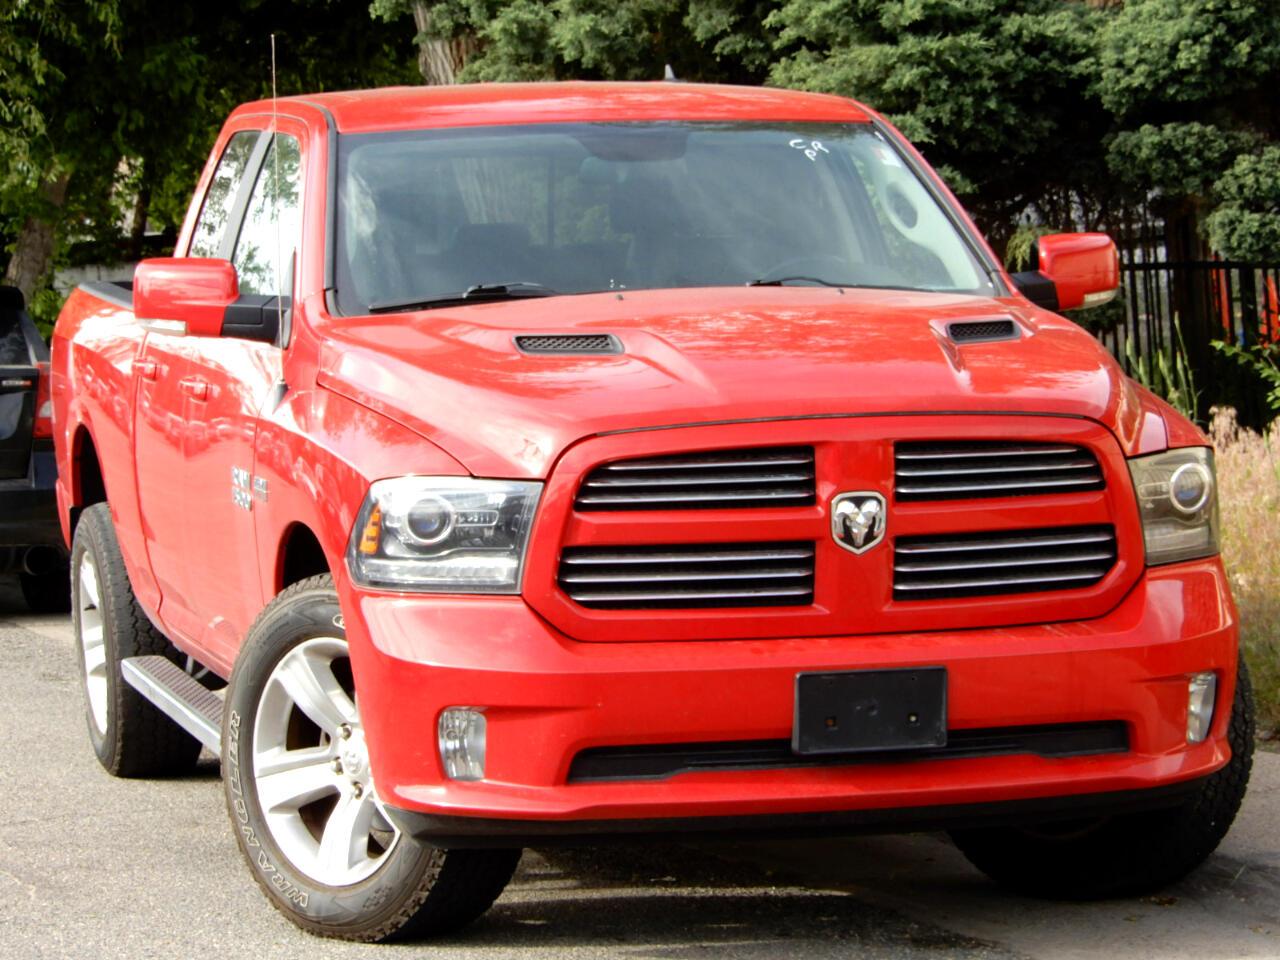 2013 RAM 1500 Sport Quad Cab 4WD